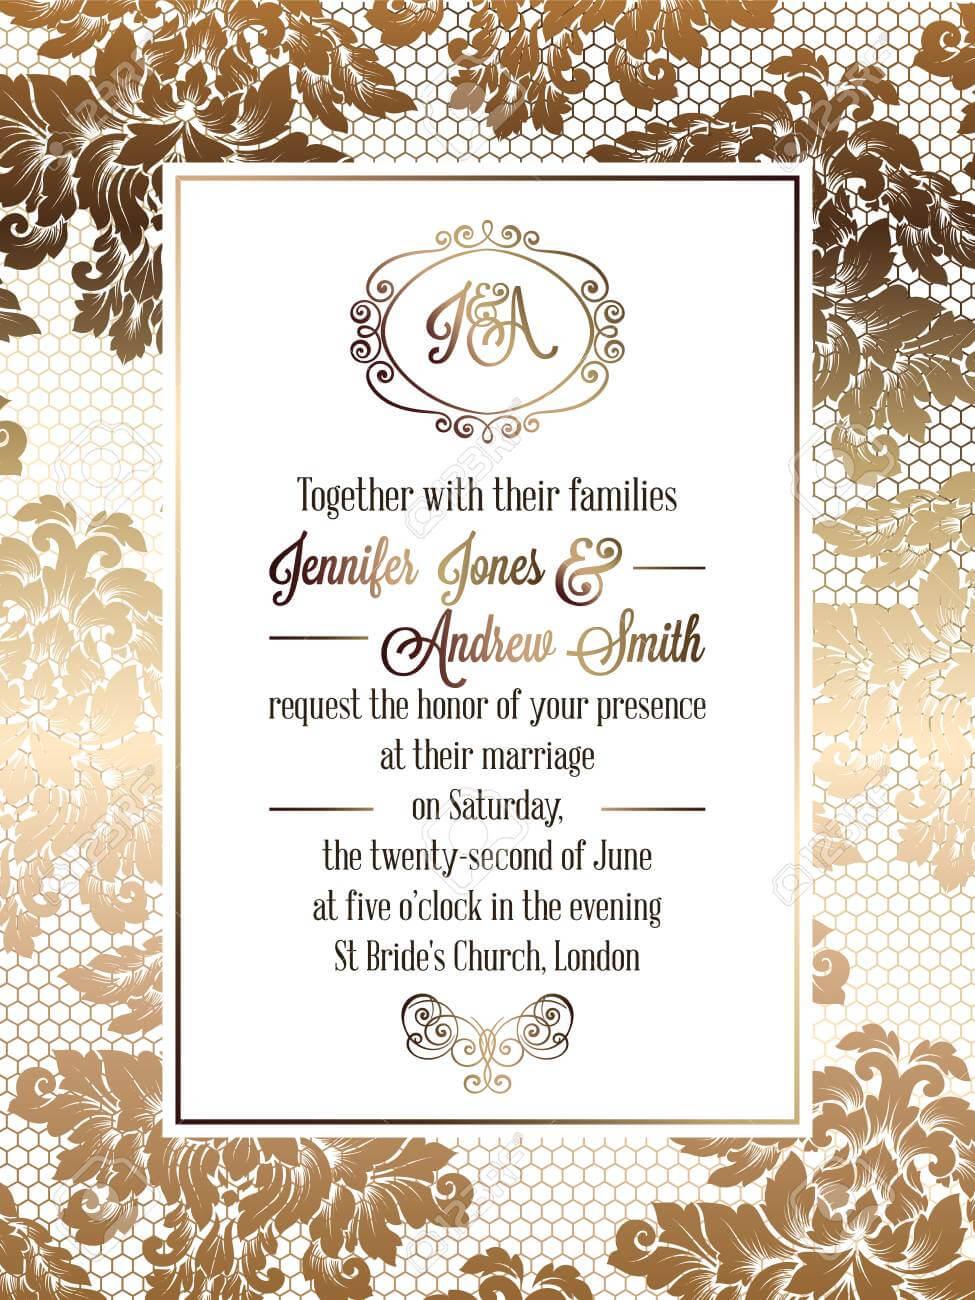 Vintage Baroque Style Wedding Invitation Card Template.. Elegant.. Pertaining To Church Wedding Invitation Card Template